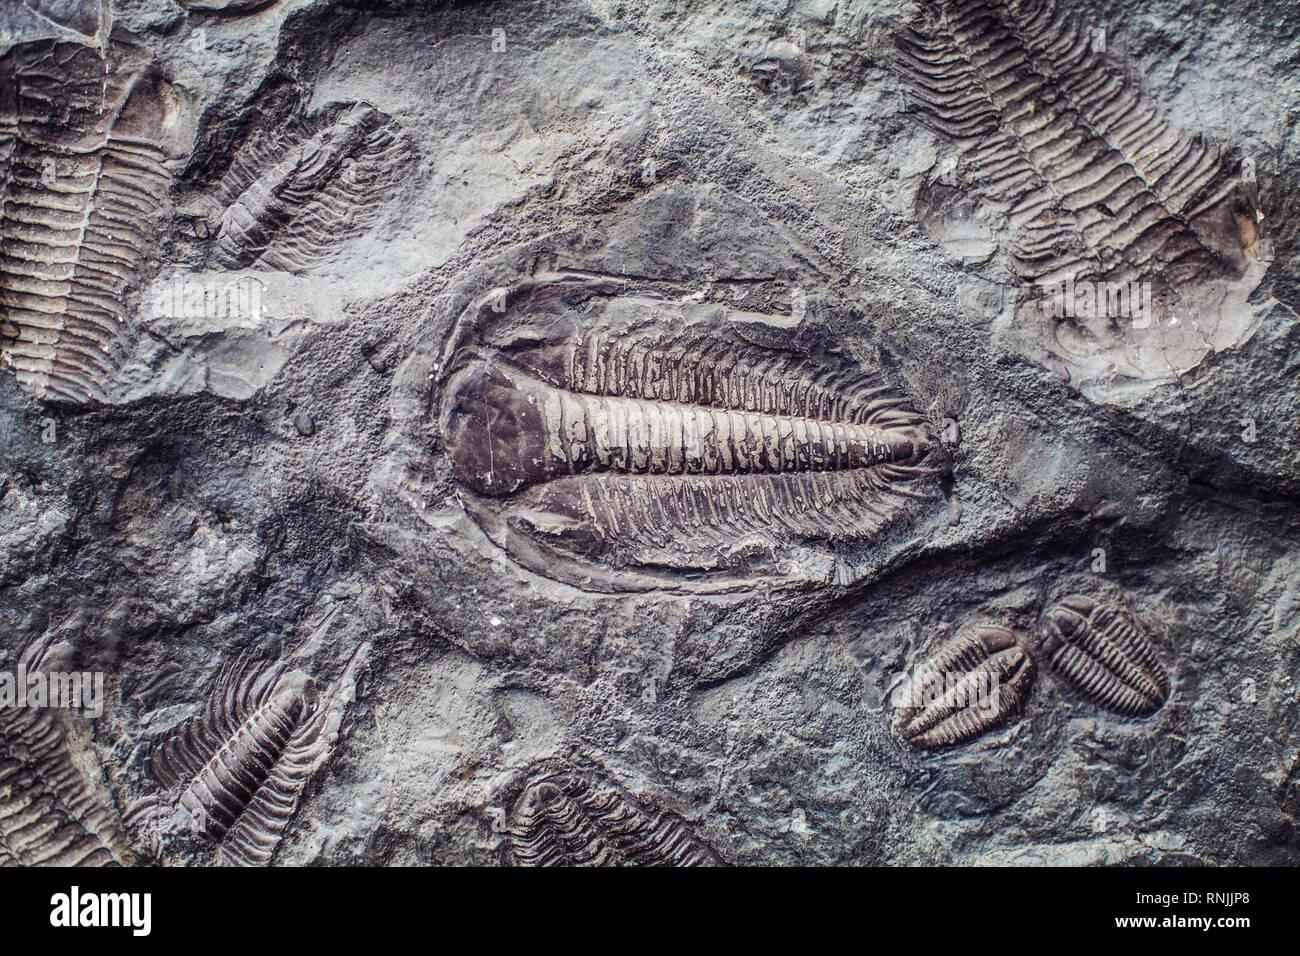 The imprint of the ancient trilobites in a stone. Trilobites, a fossil group of extinct marine arachnomorph arthropods, class Trilobita - Stock Image